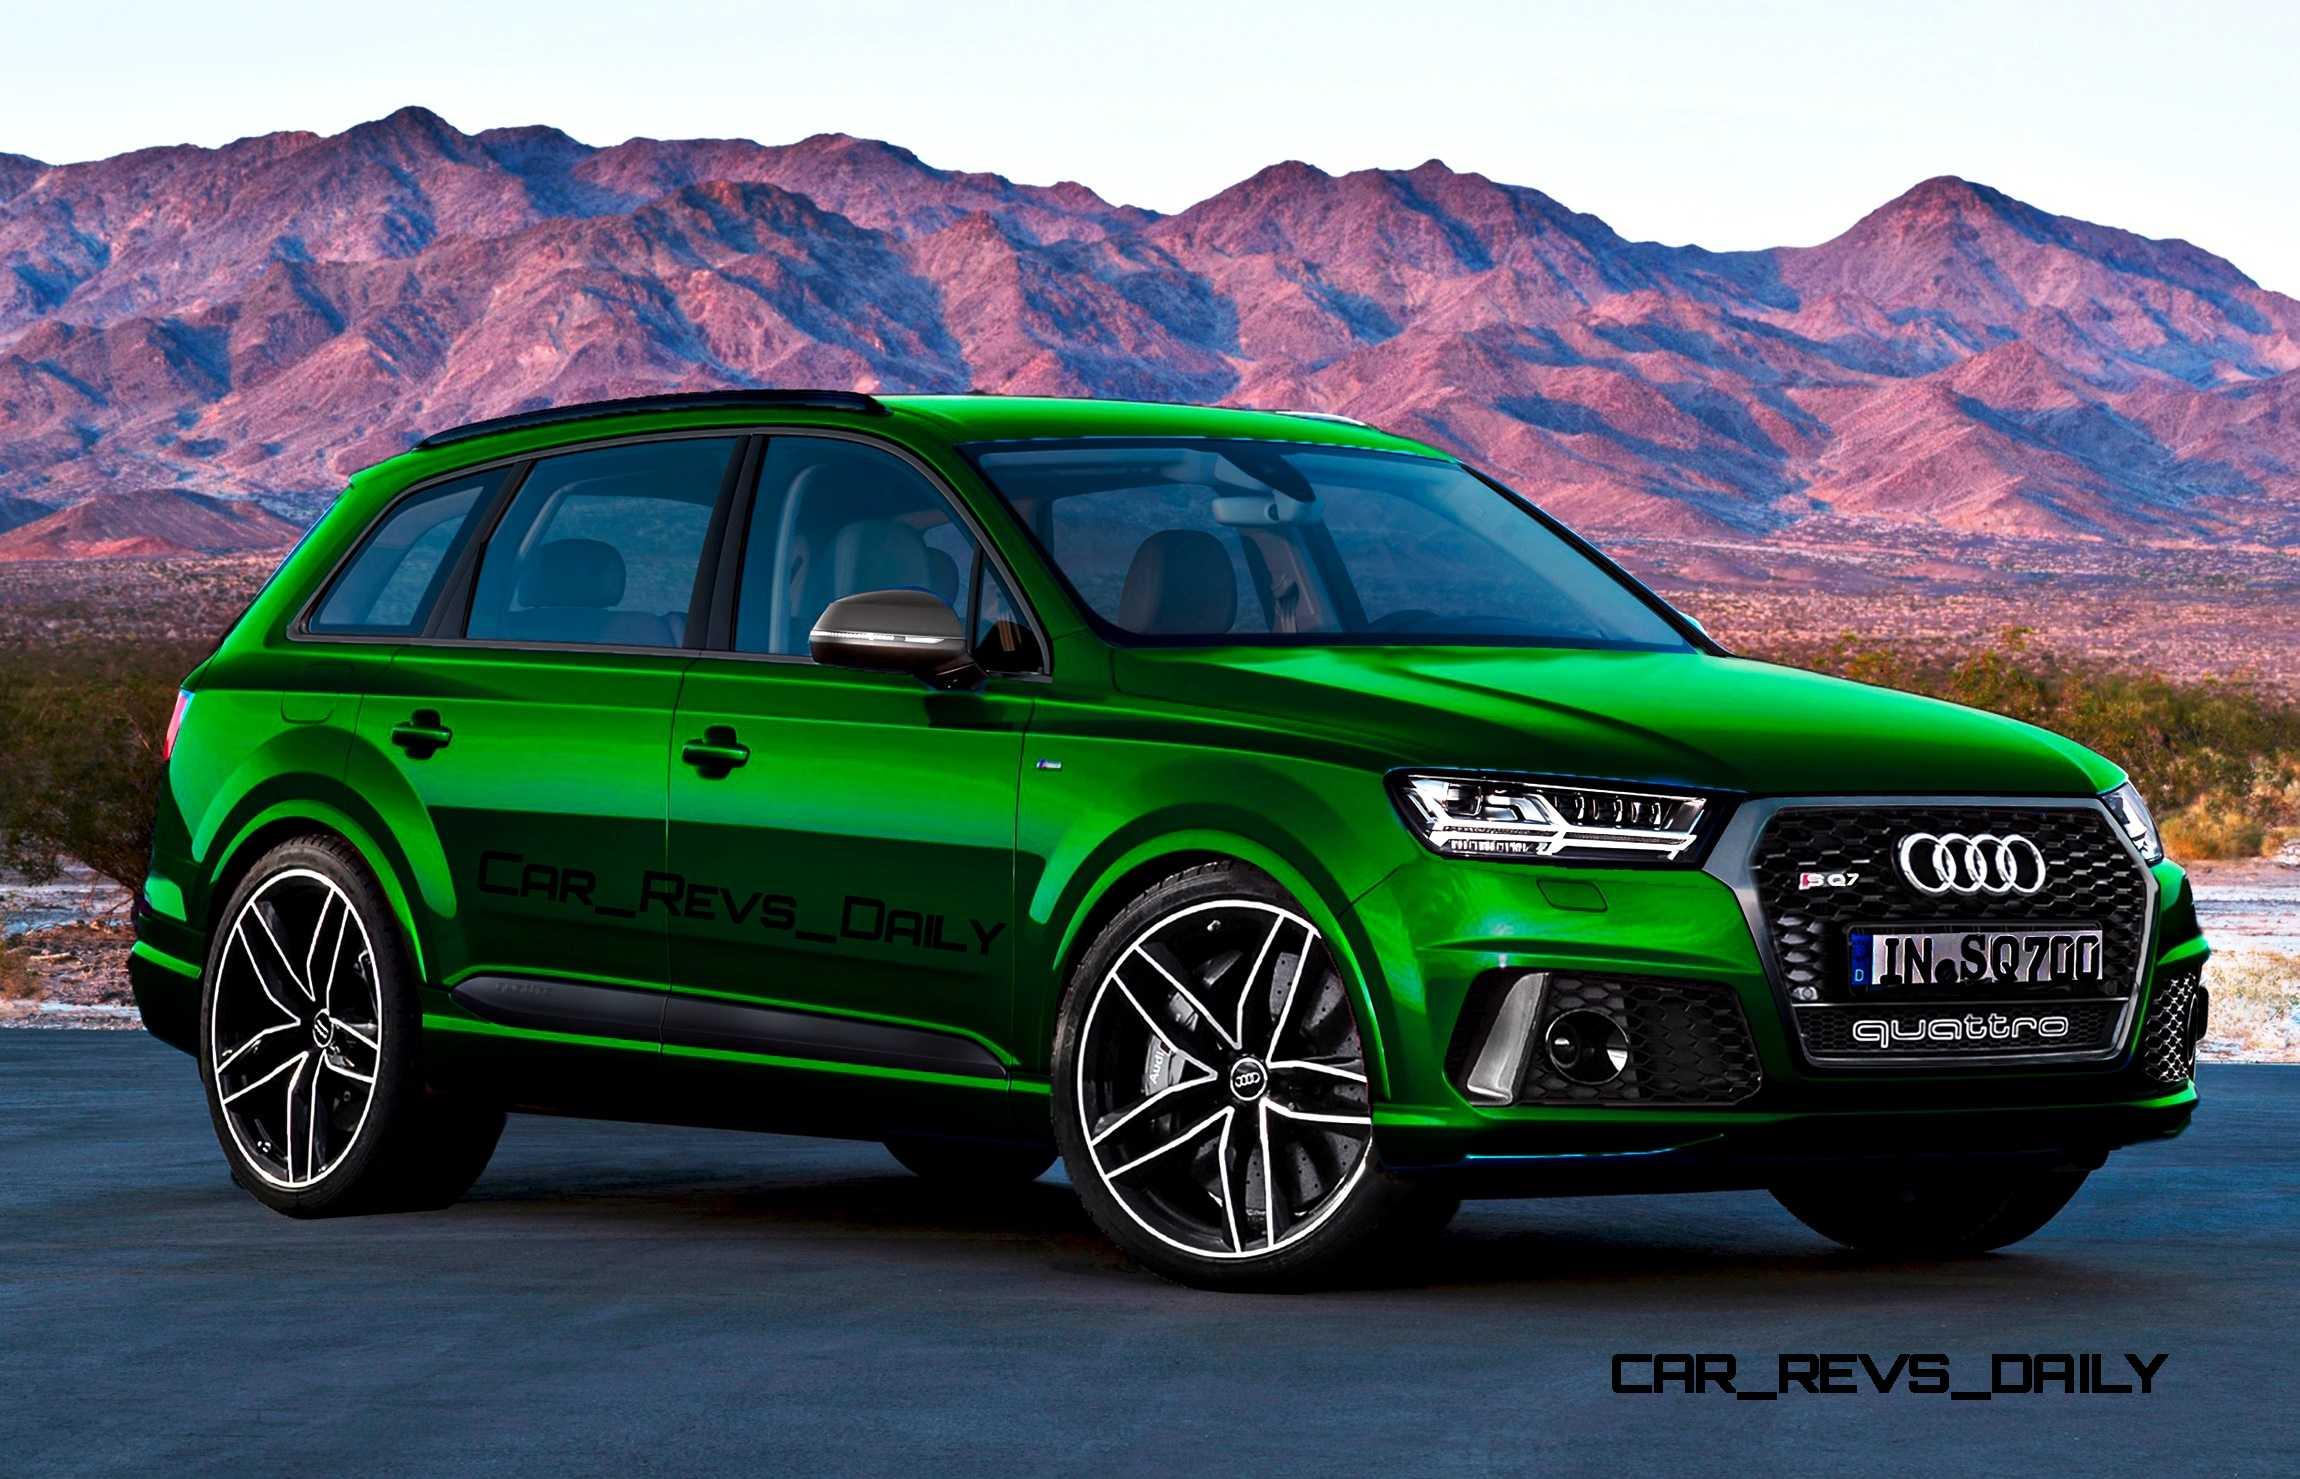 Future Suv Renderings 2016 Audi Rs Q7 6